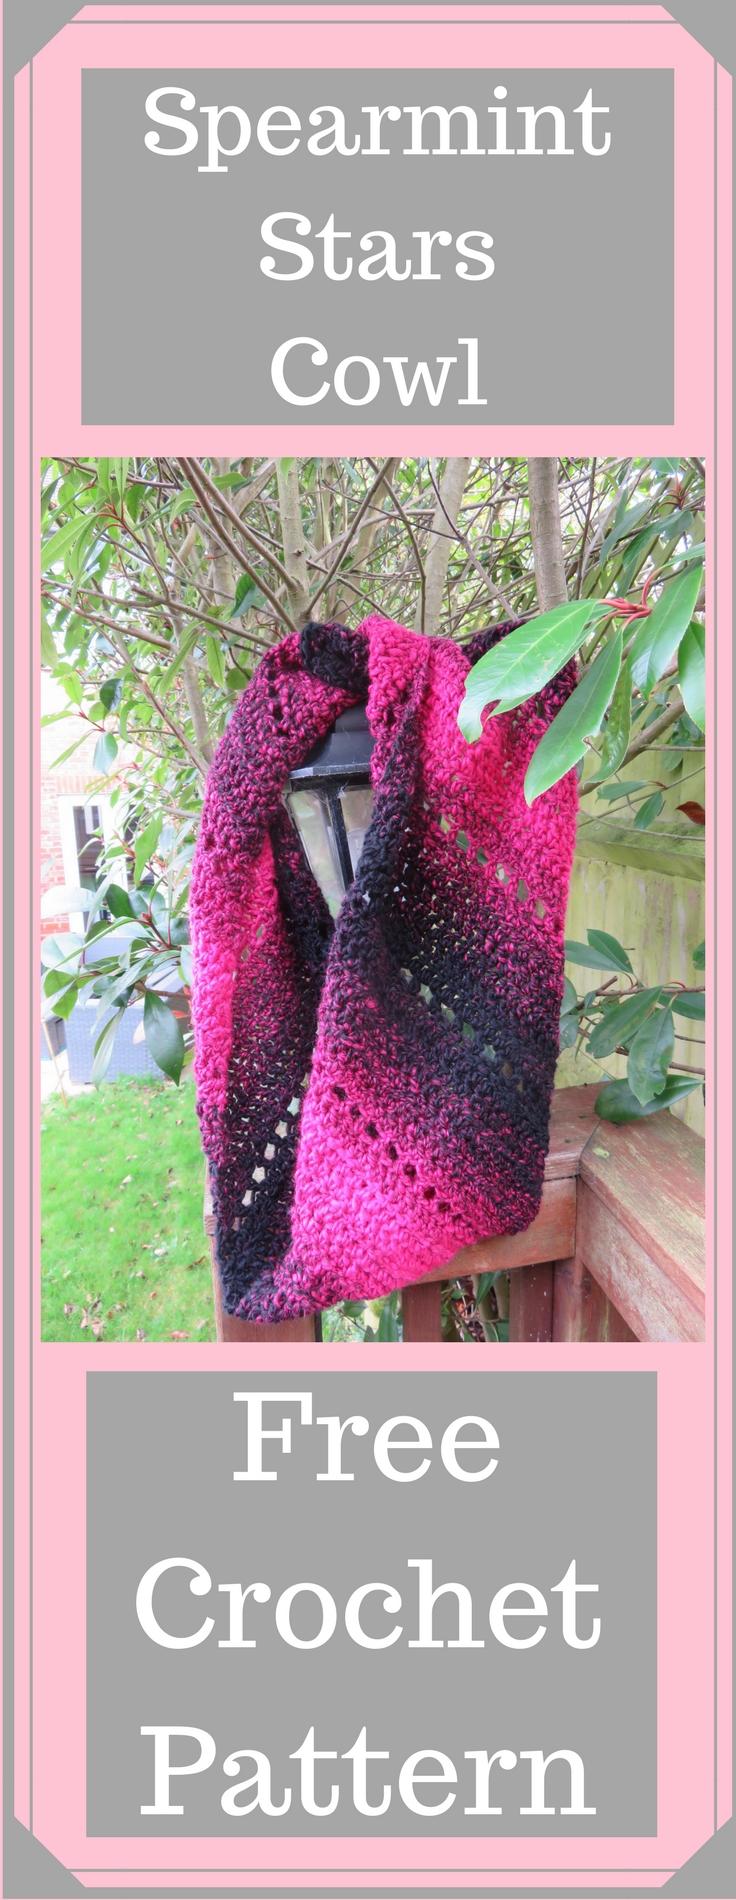 Spearmint Stars from Crochet247